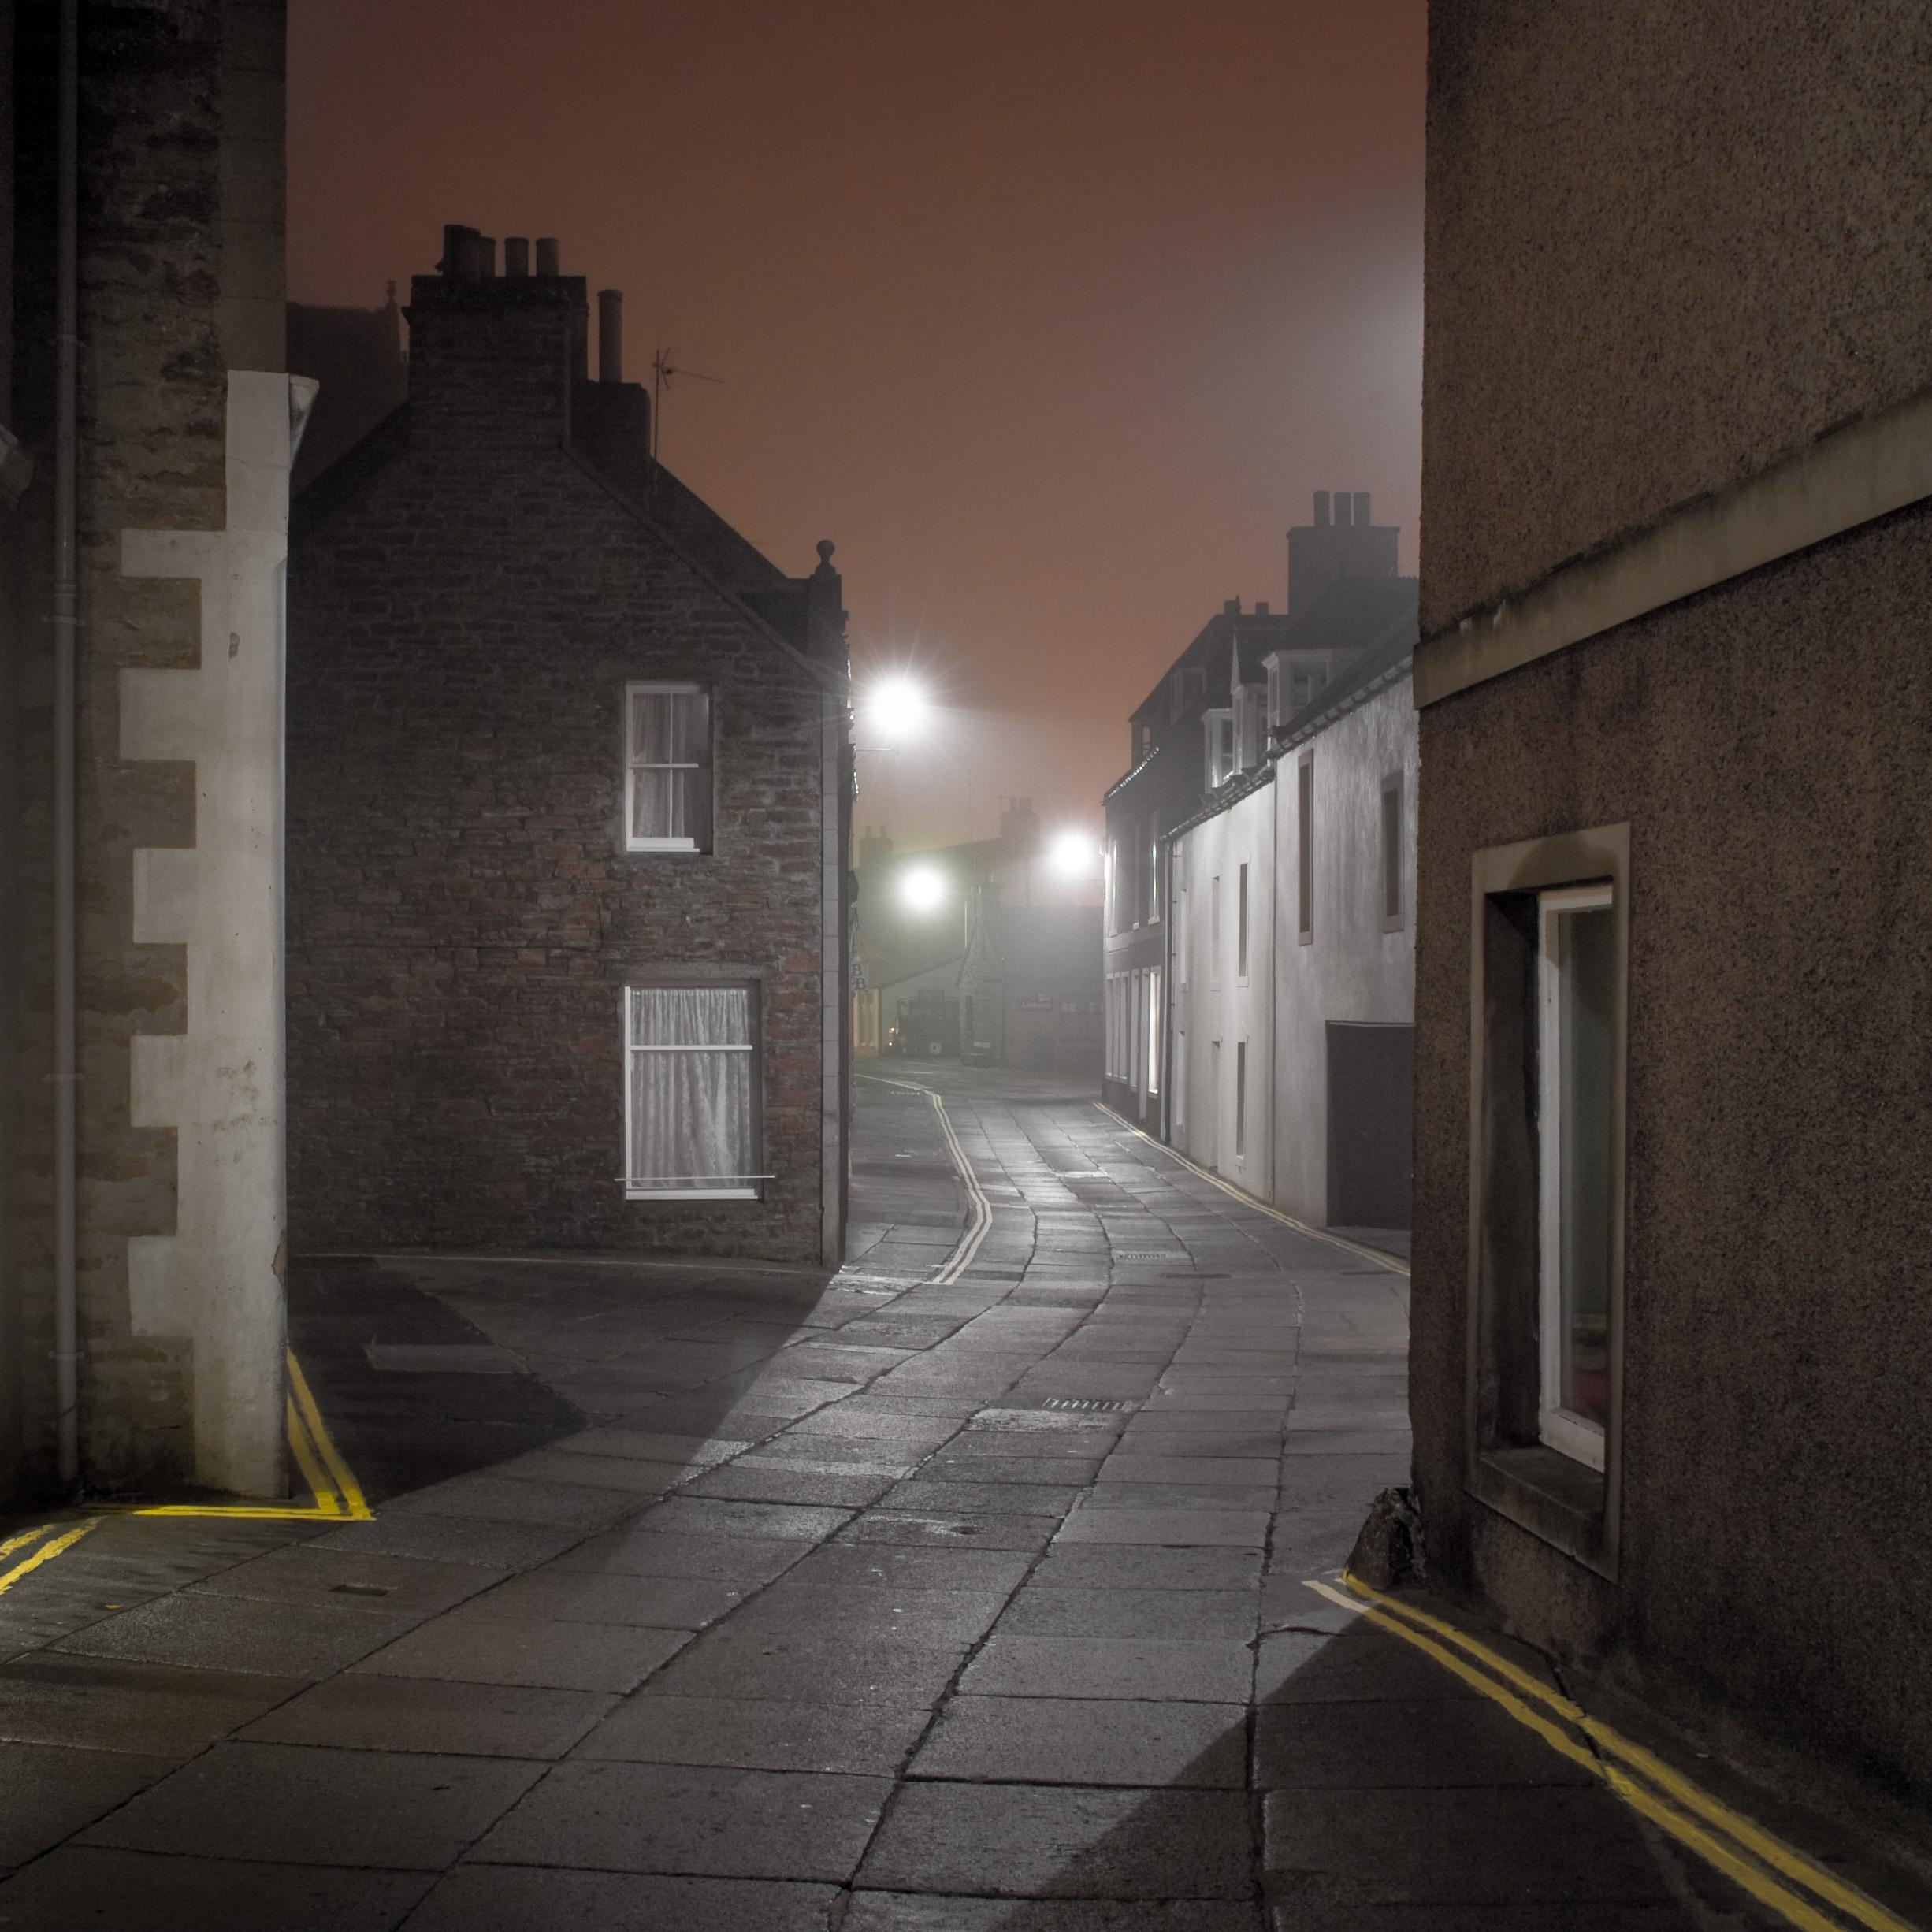 2. Stromness, Orkney, Scotland.